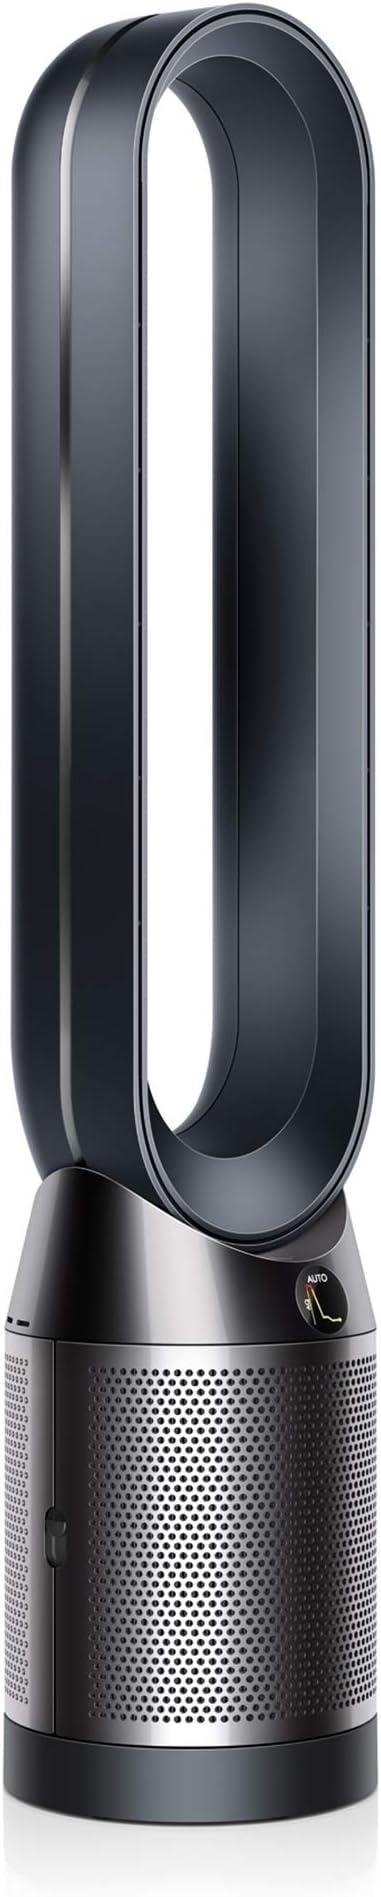 Dyson Pure Cool - Purificador de aire (64 dB, 1,8 m, Negro, Piso ...